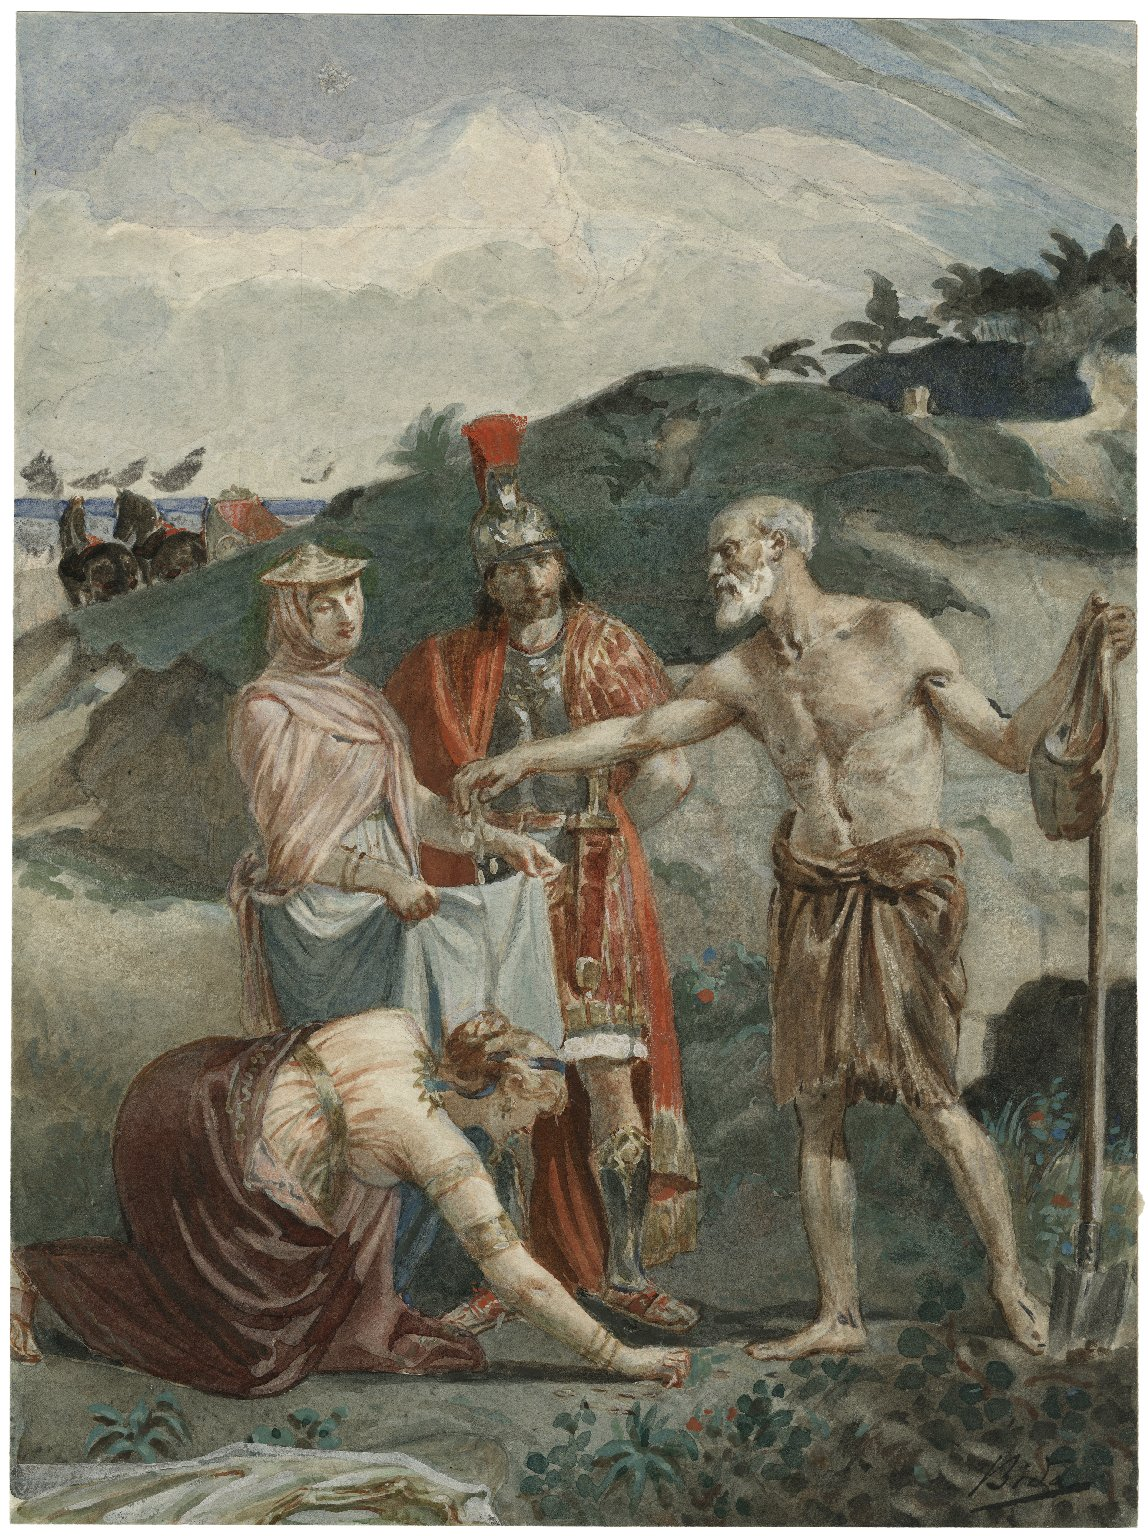 [Timon of Athens, IV, 3, Timon giving gold to the whores, Phrynia and Timandra, Alcibiades] [graphic] / Bida.